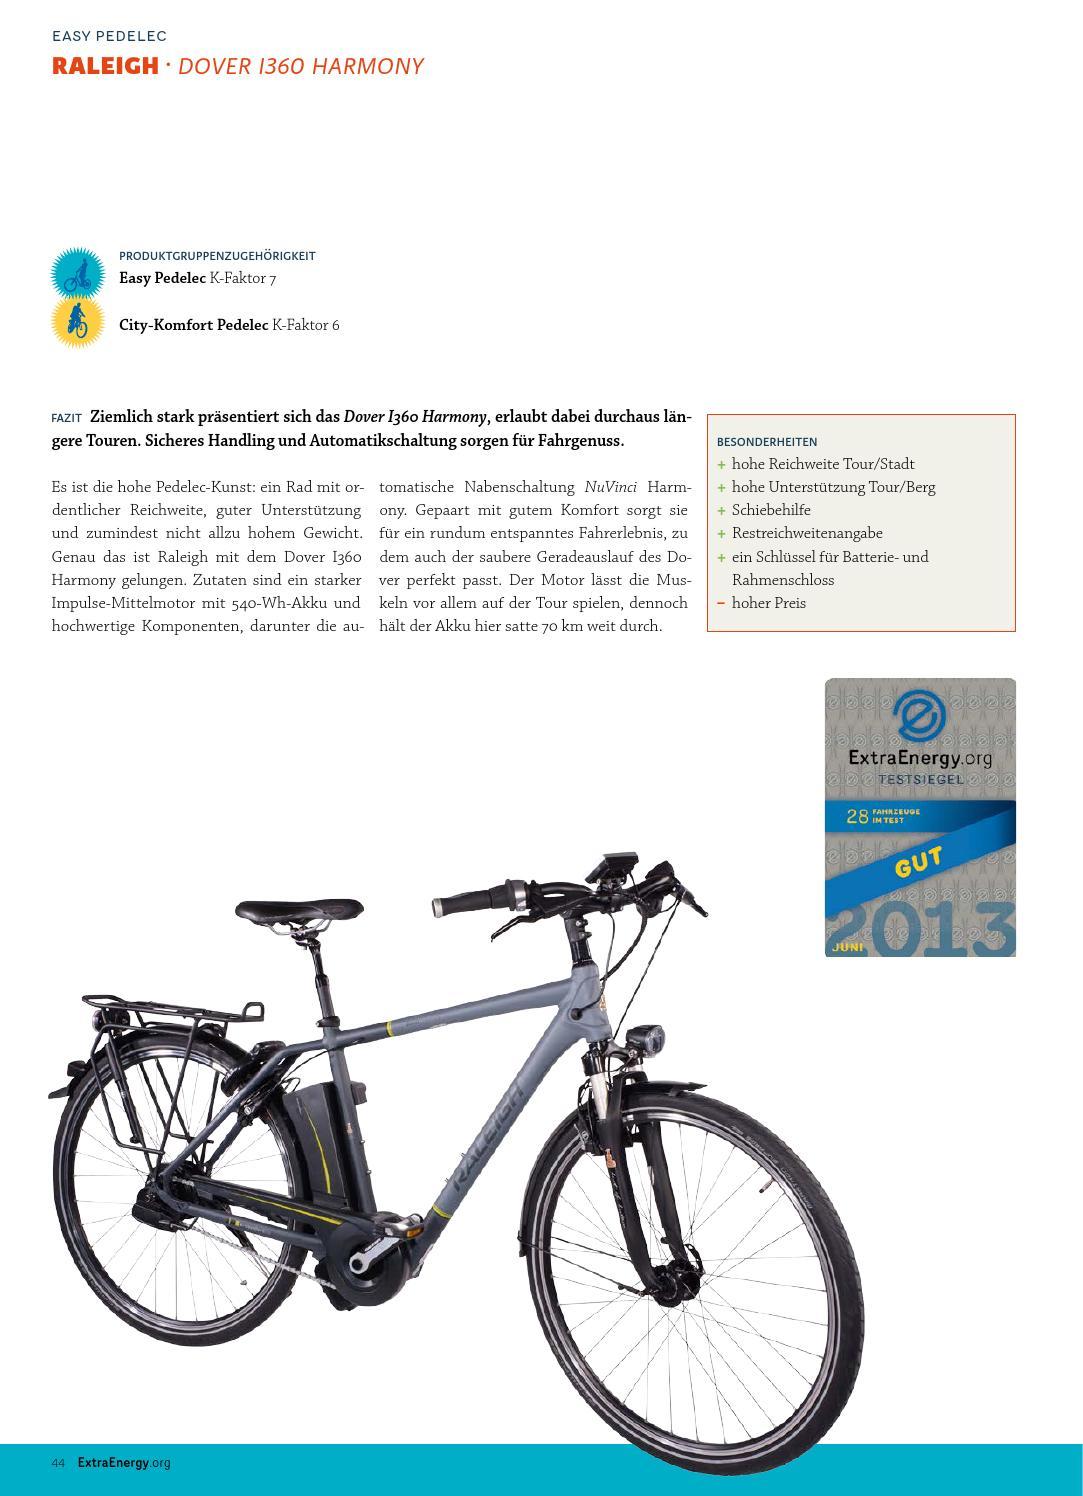 pedelec und e bike magazin nr 8 by extraenergy issuu. Black Bedroom Furniture Sets. Home Design Ideas